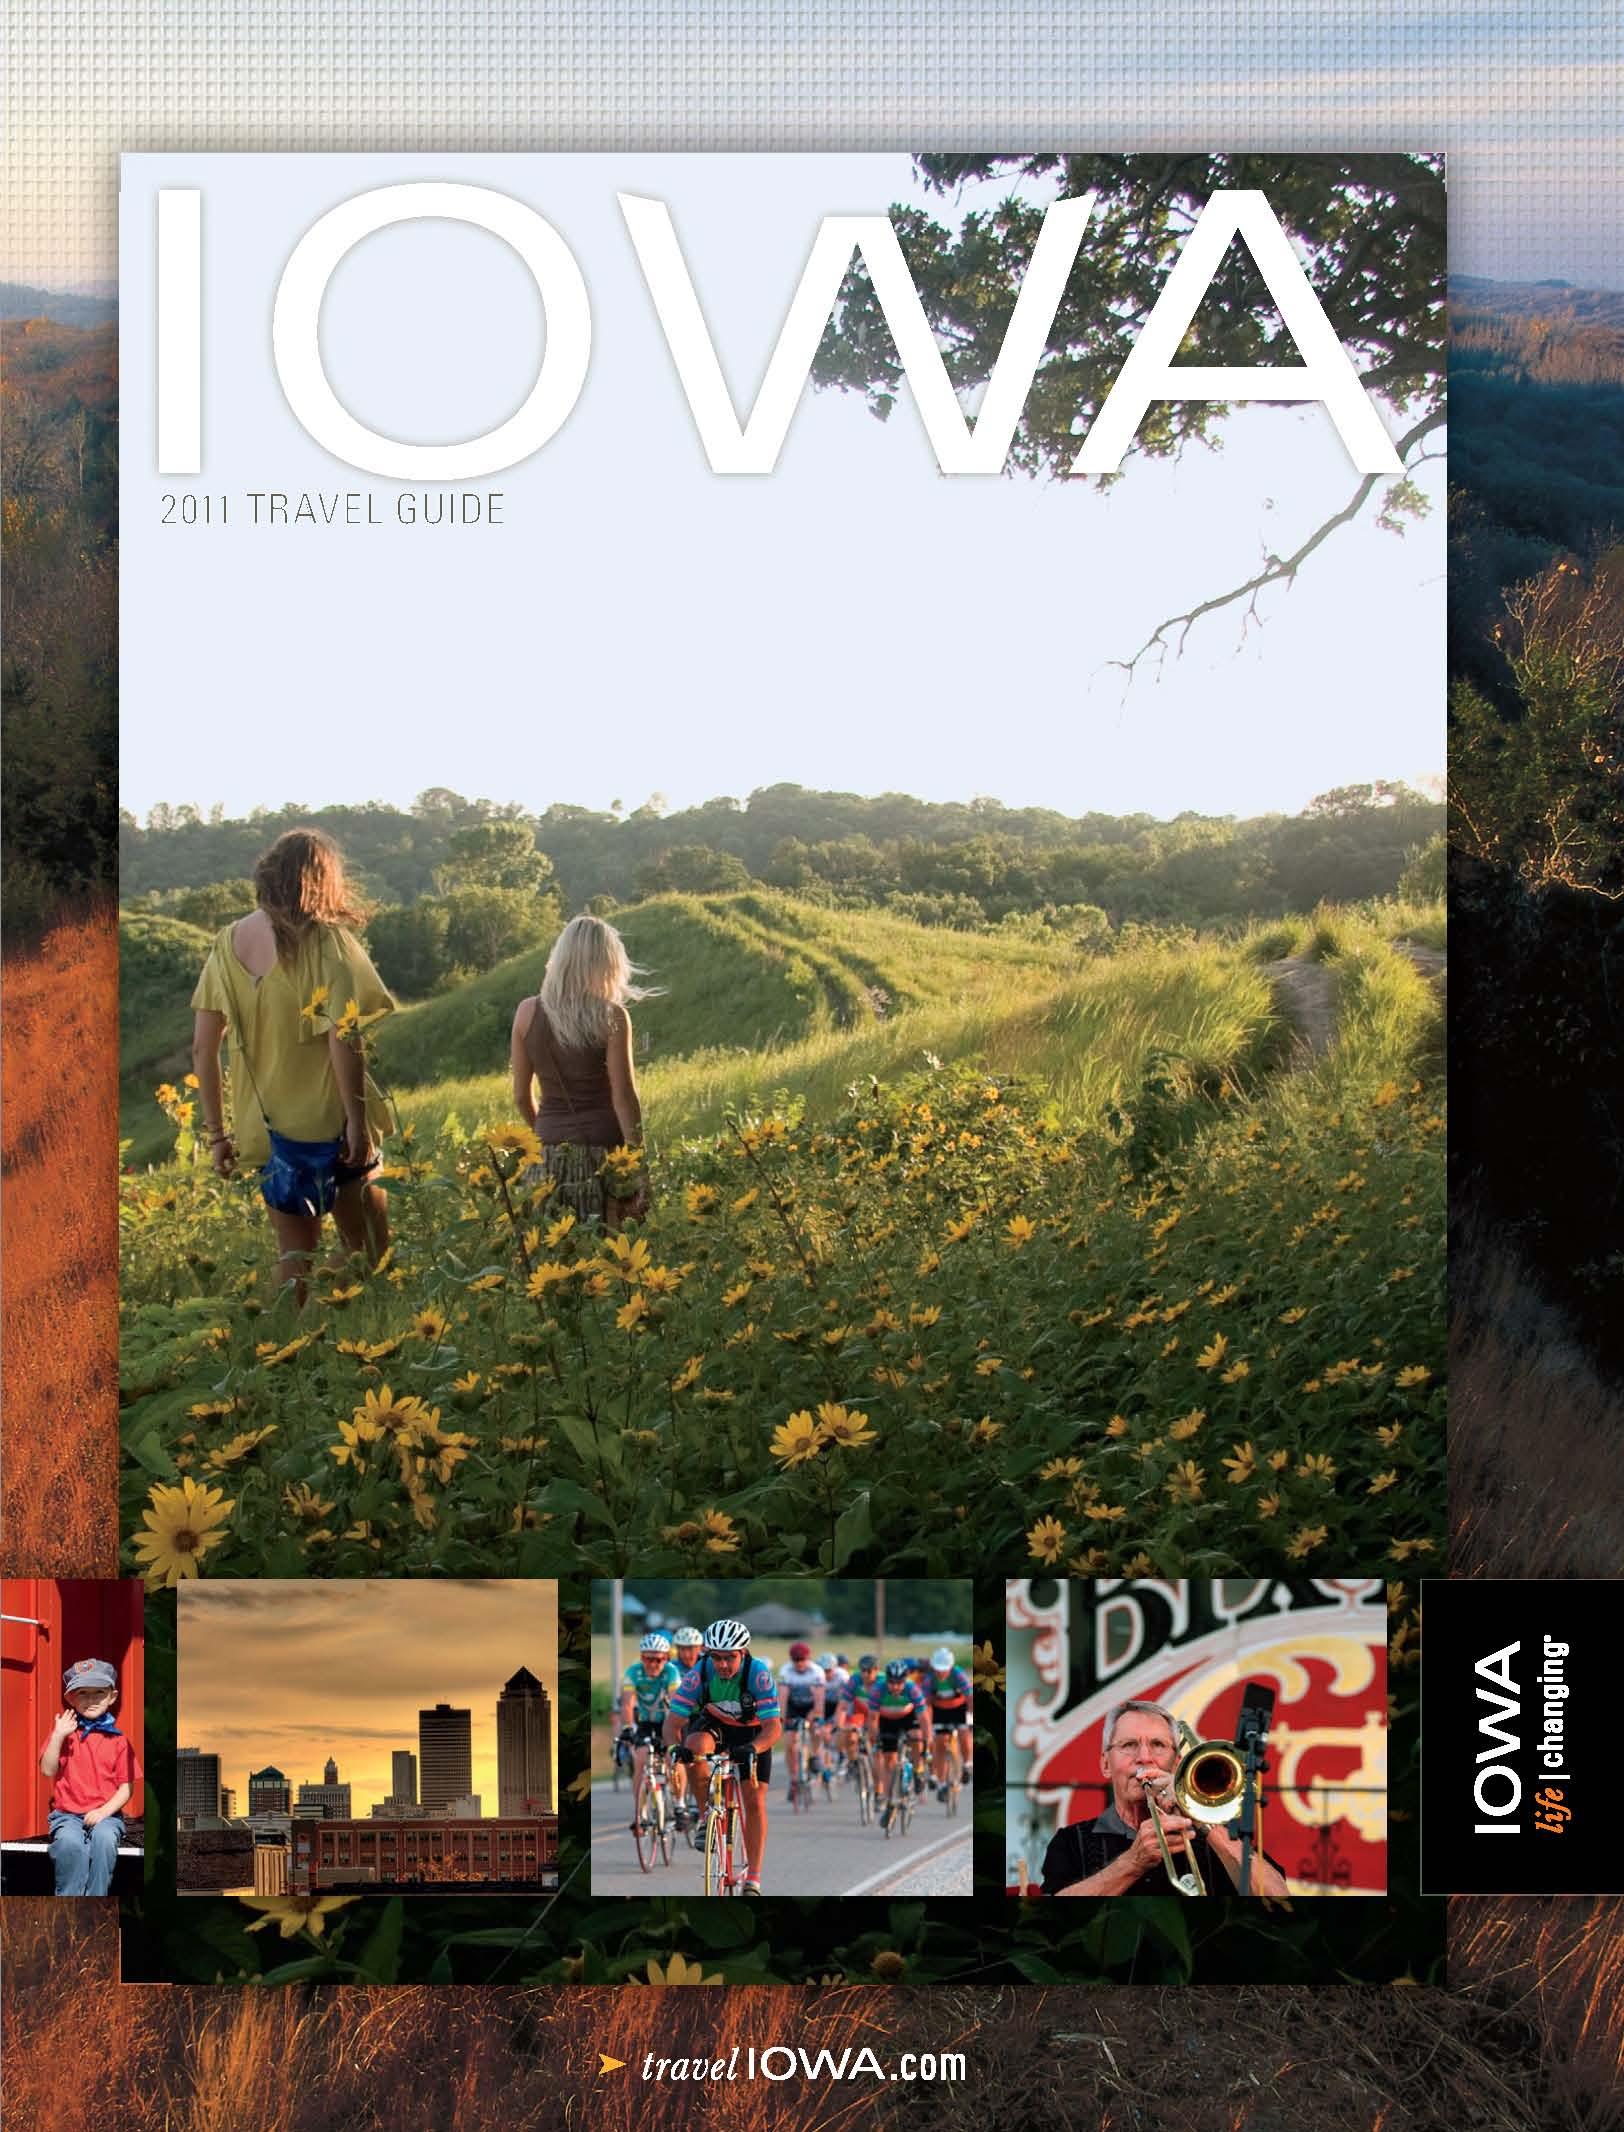 Iowa Travel Guide 2011